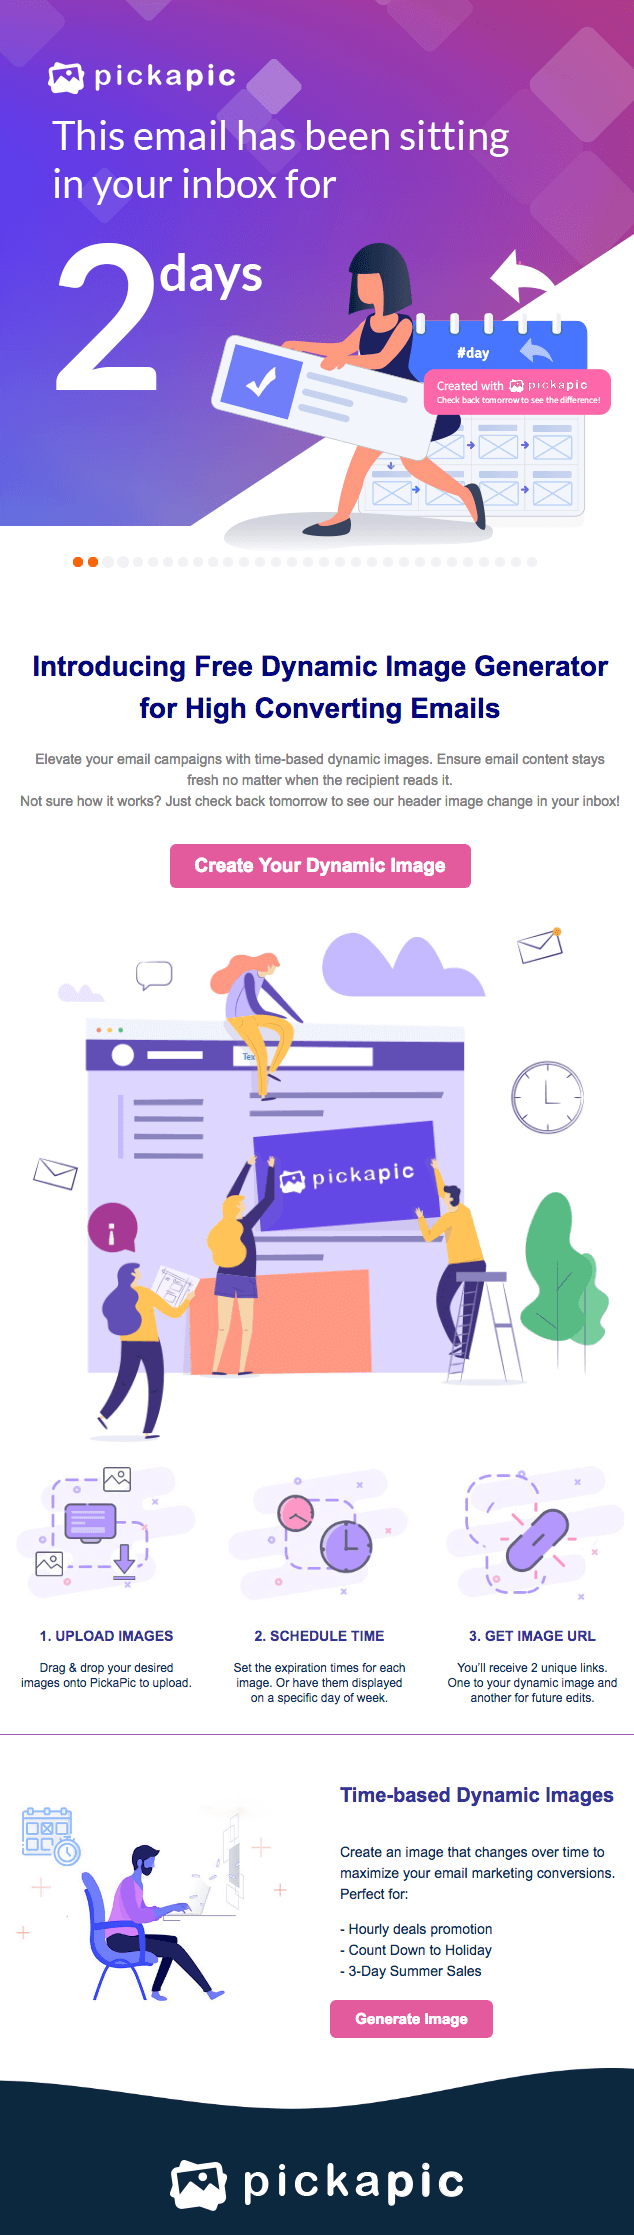 email marketing inspiration pickapic